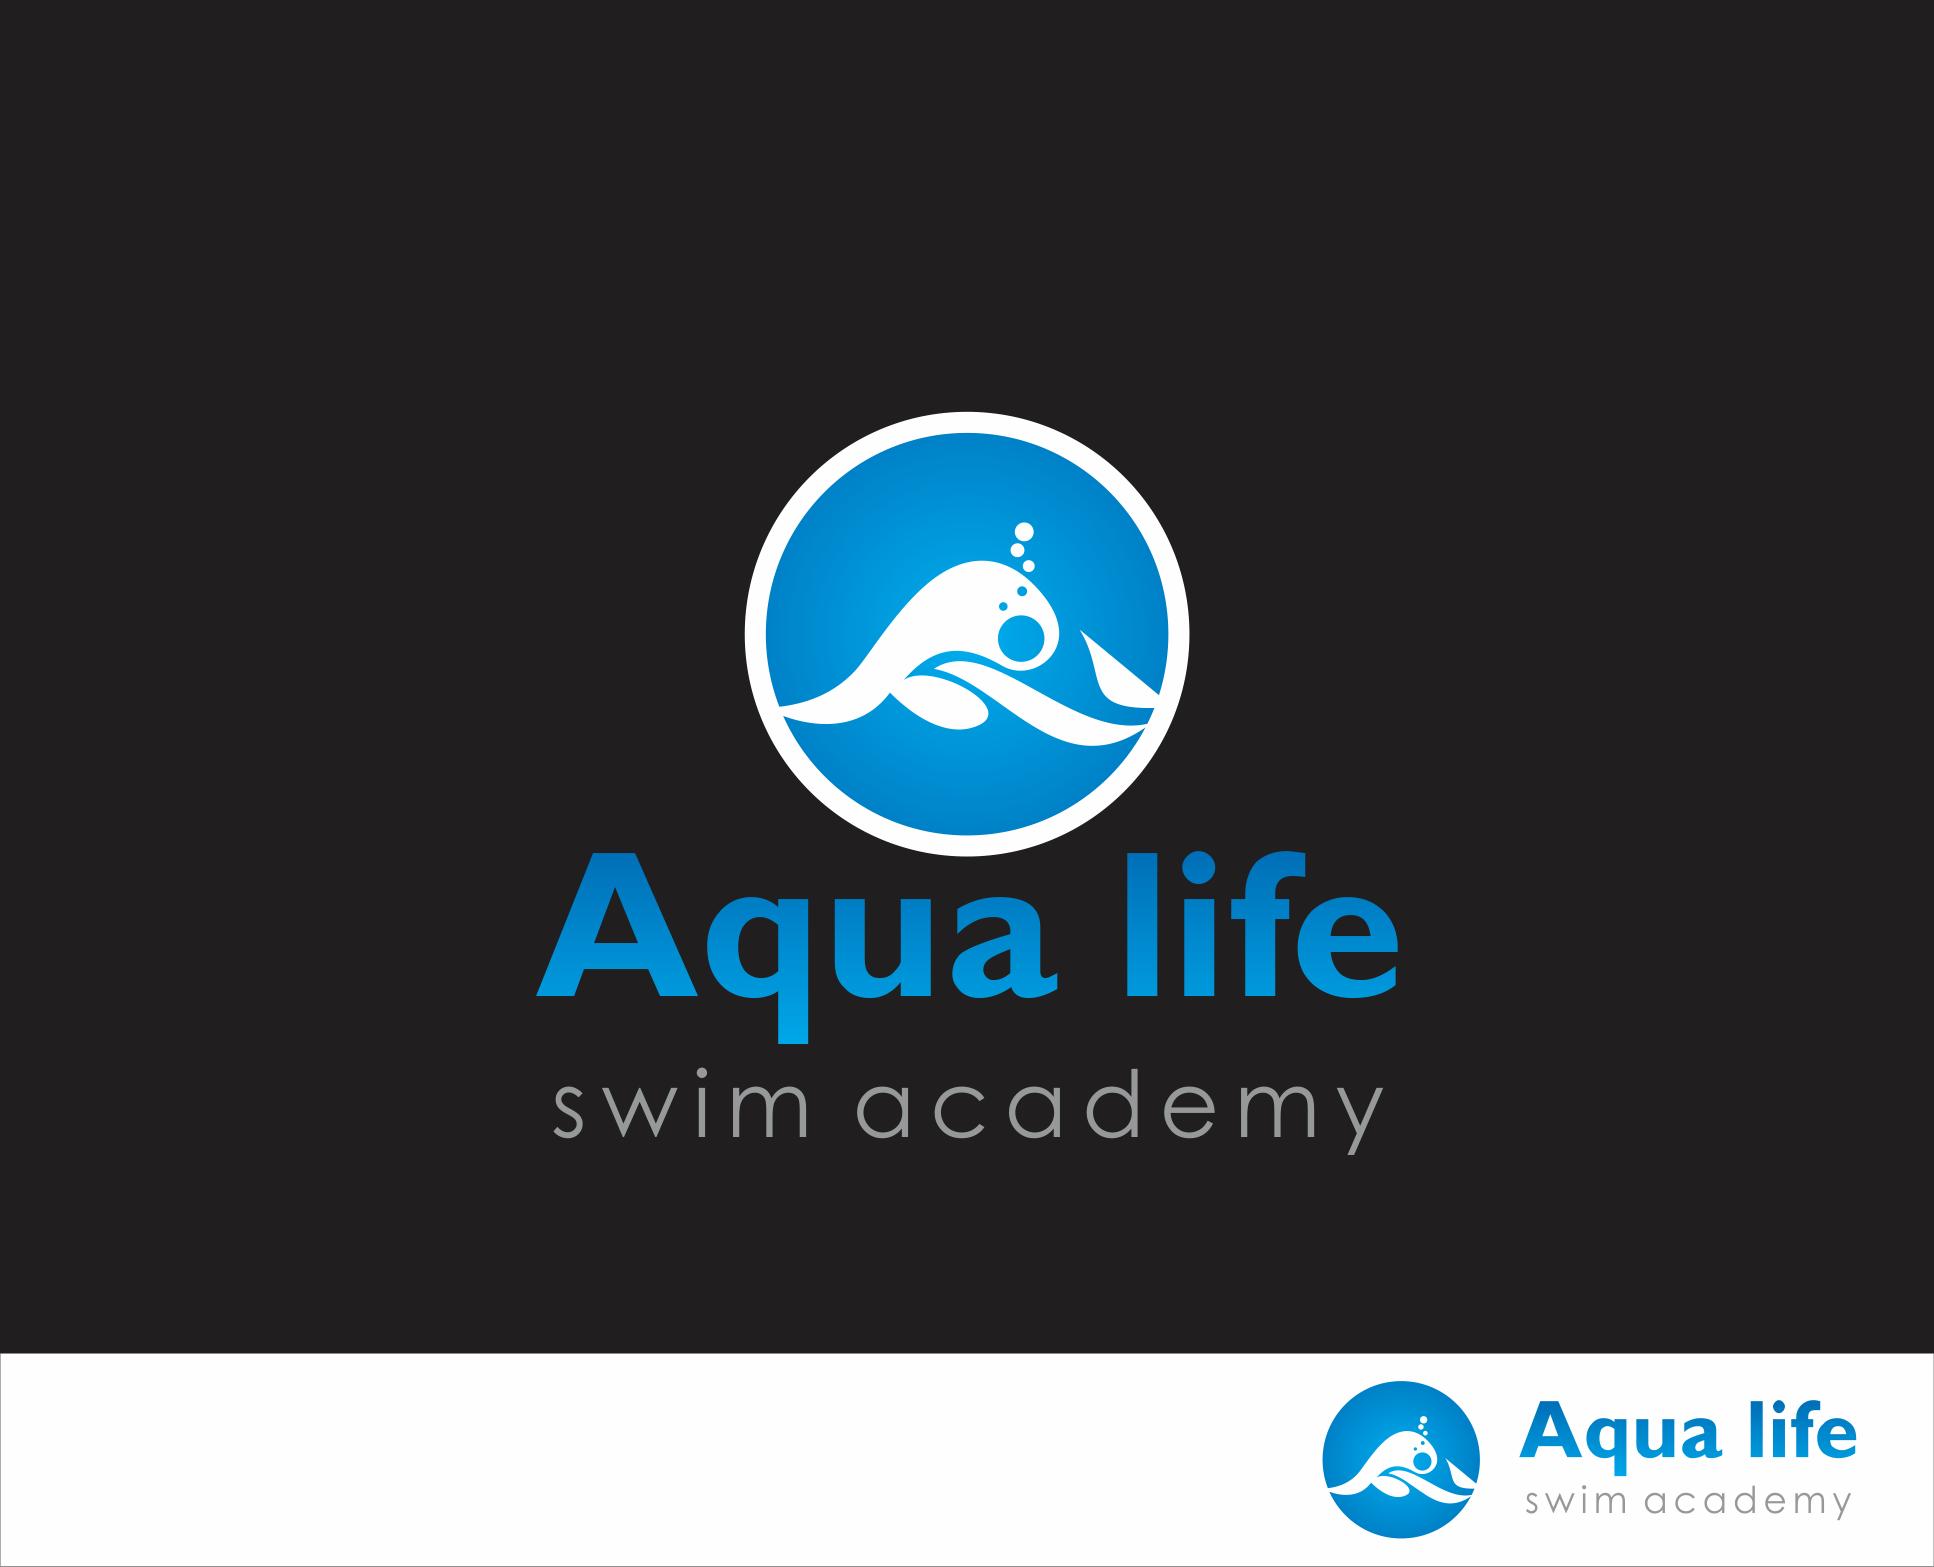 Logo Design by Armada Jamaluddin - Entry No. 168 in the Logo Design Contest Artistic Logo Design Wanted for The Aqua Life Swim Academy.